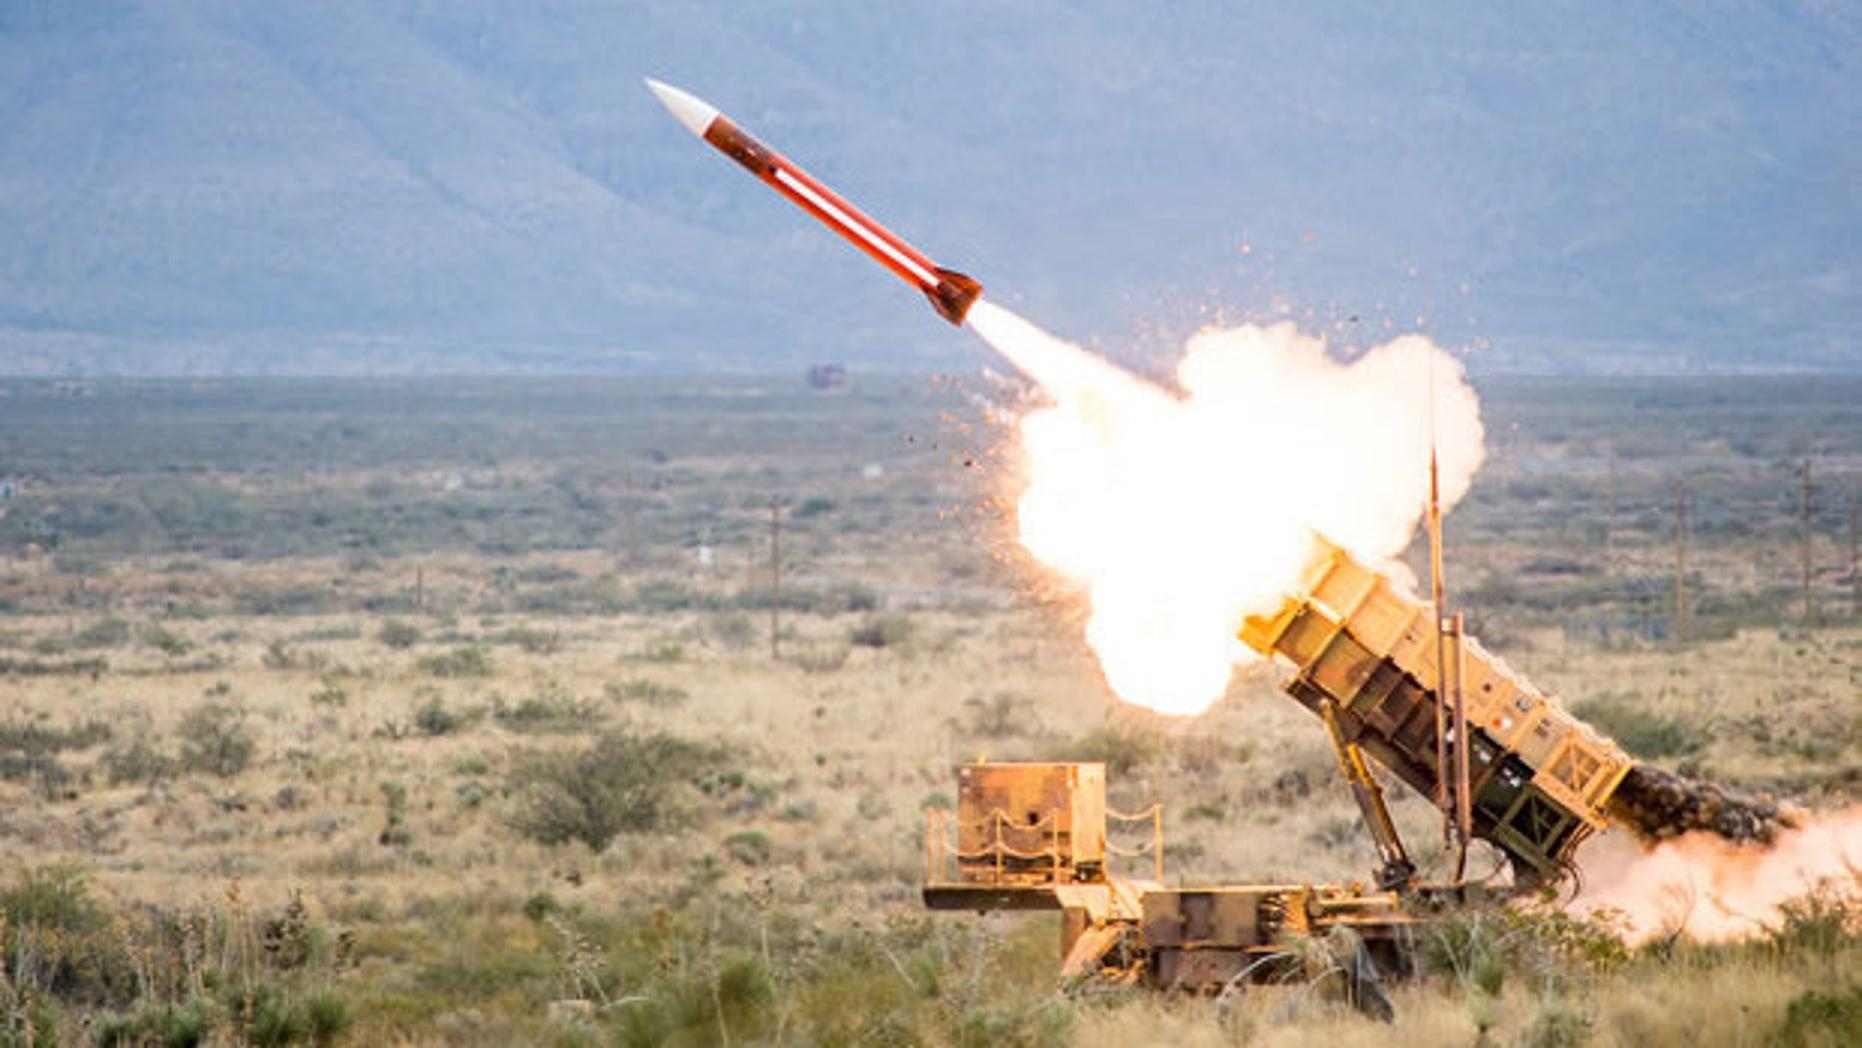 File photo (Raytheon Company)